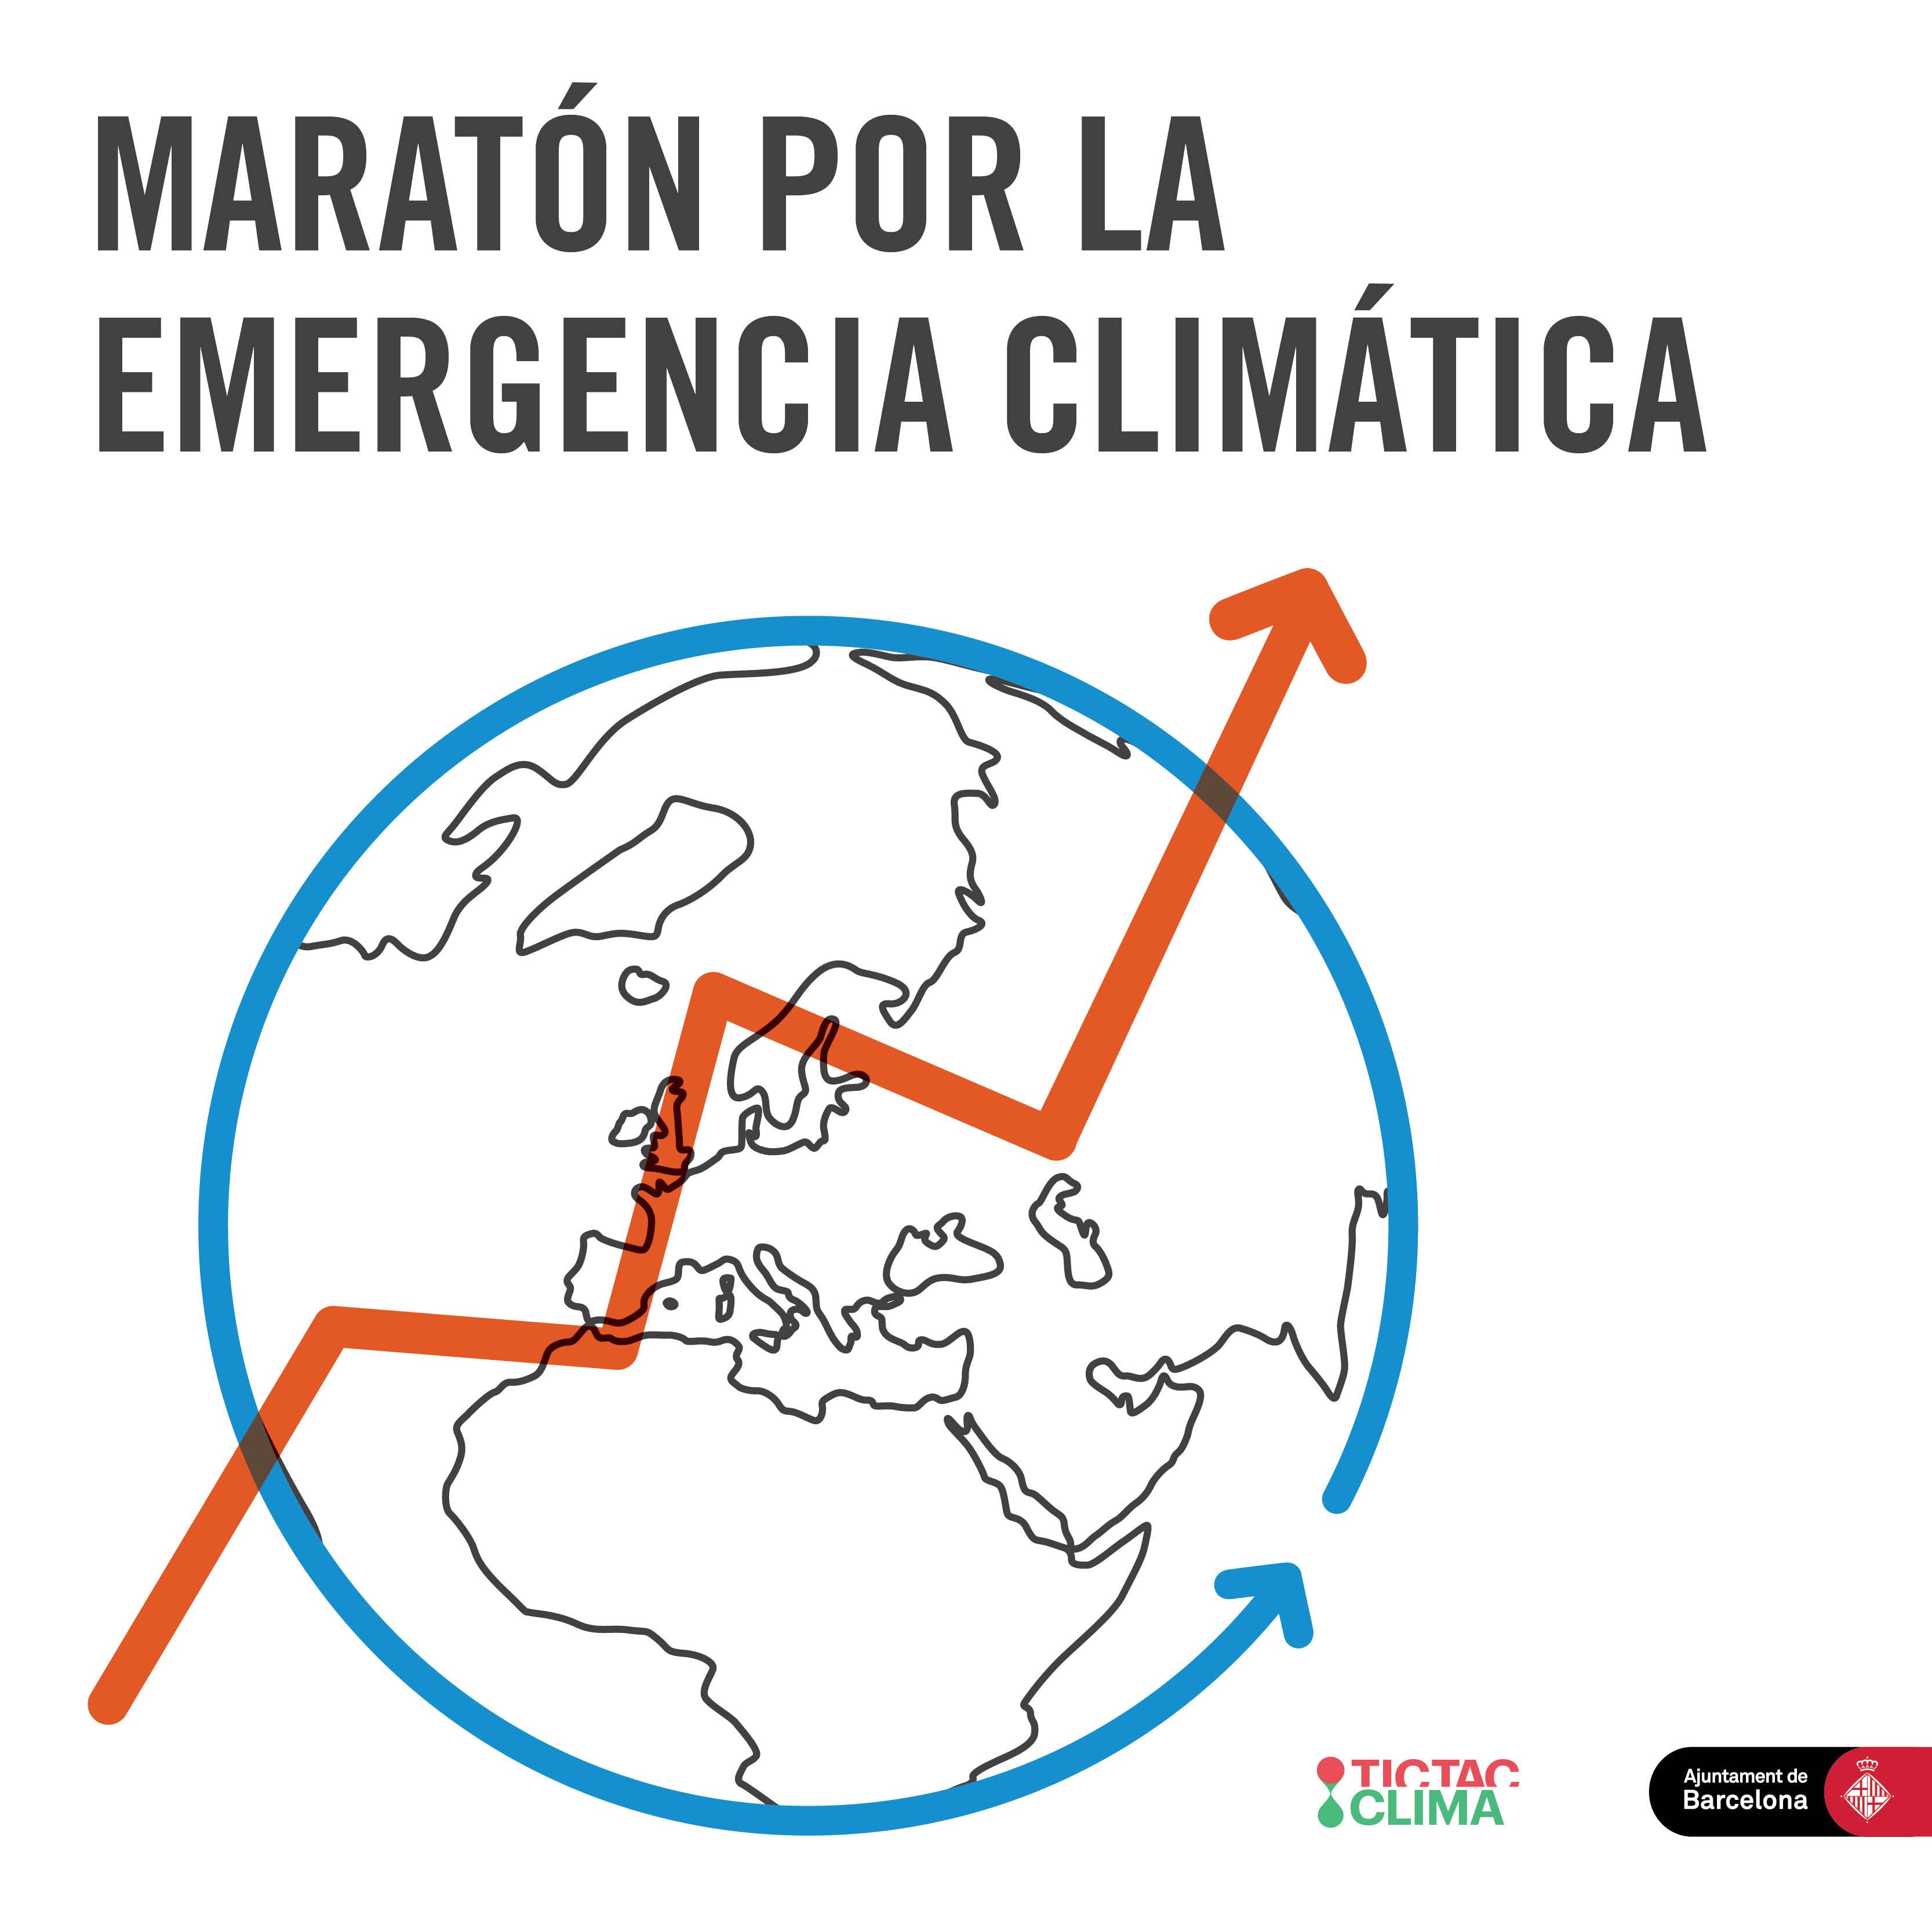 Maratón por la Emergencia Climática